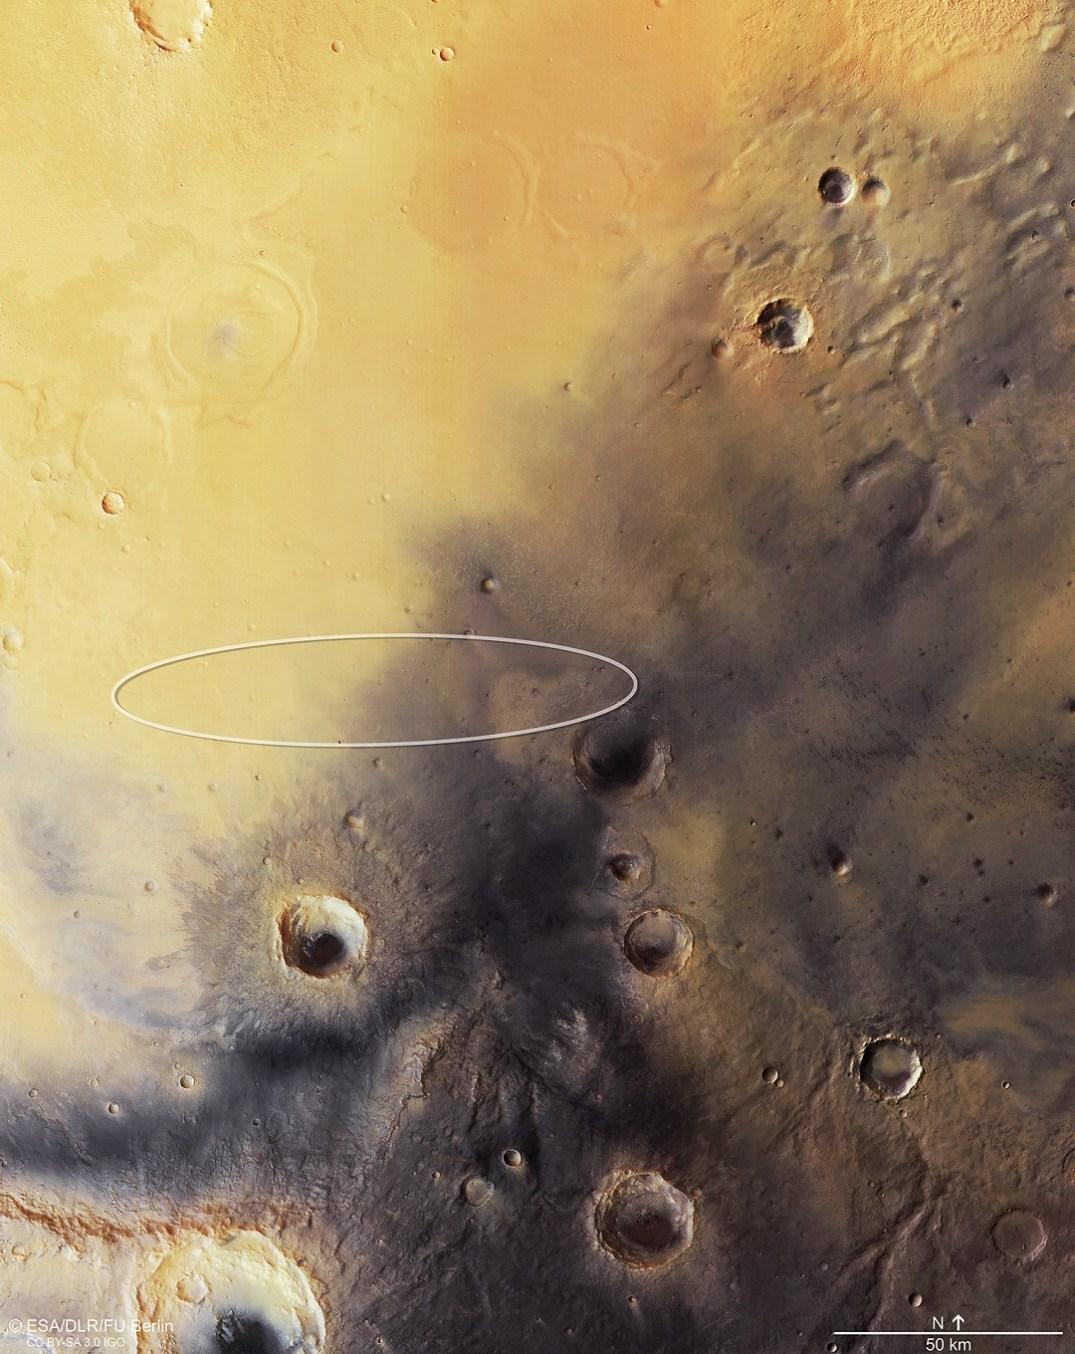 http://www.esa.int/var/esa/storage/images/esa_multimedia/images/2016/08/mars_express_image_of_schiaparelli_s_landing_site_with_ellipse/16091402-1-eng-GB/Mars_Express_image_of_Schiaparelli_s_landing_site_with_ellipse.jpg